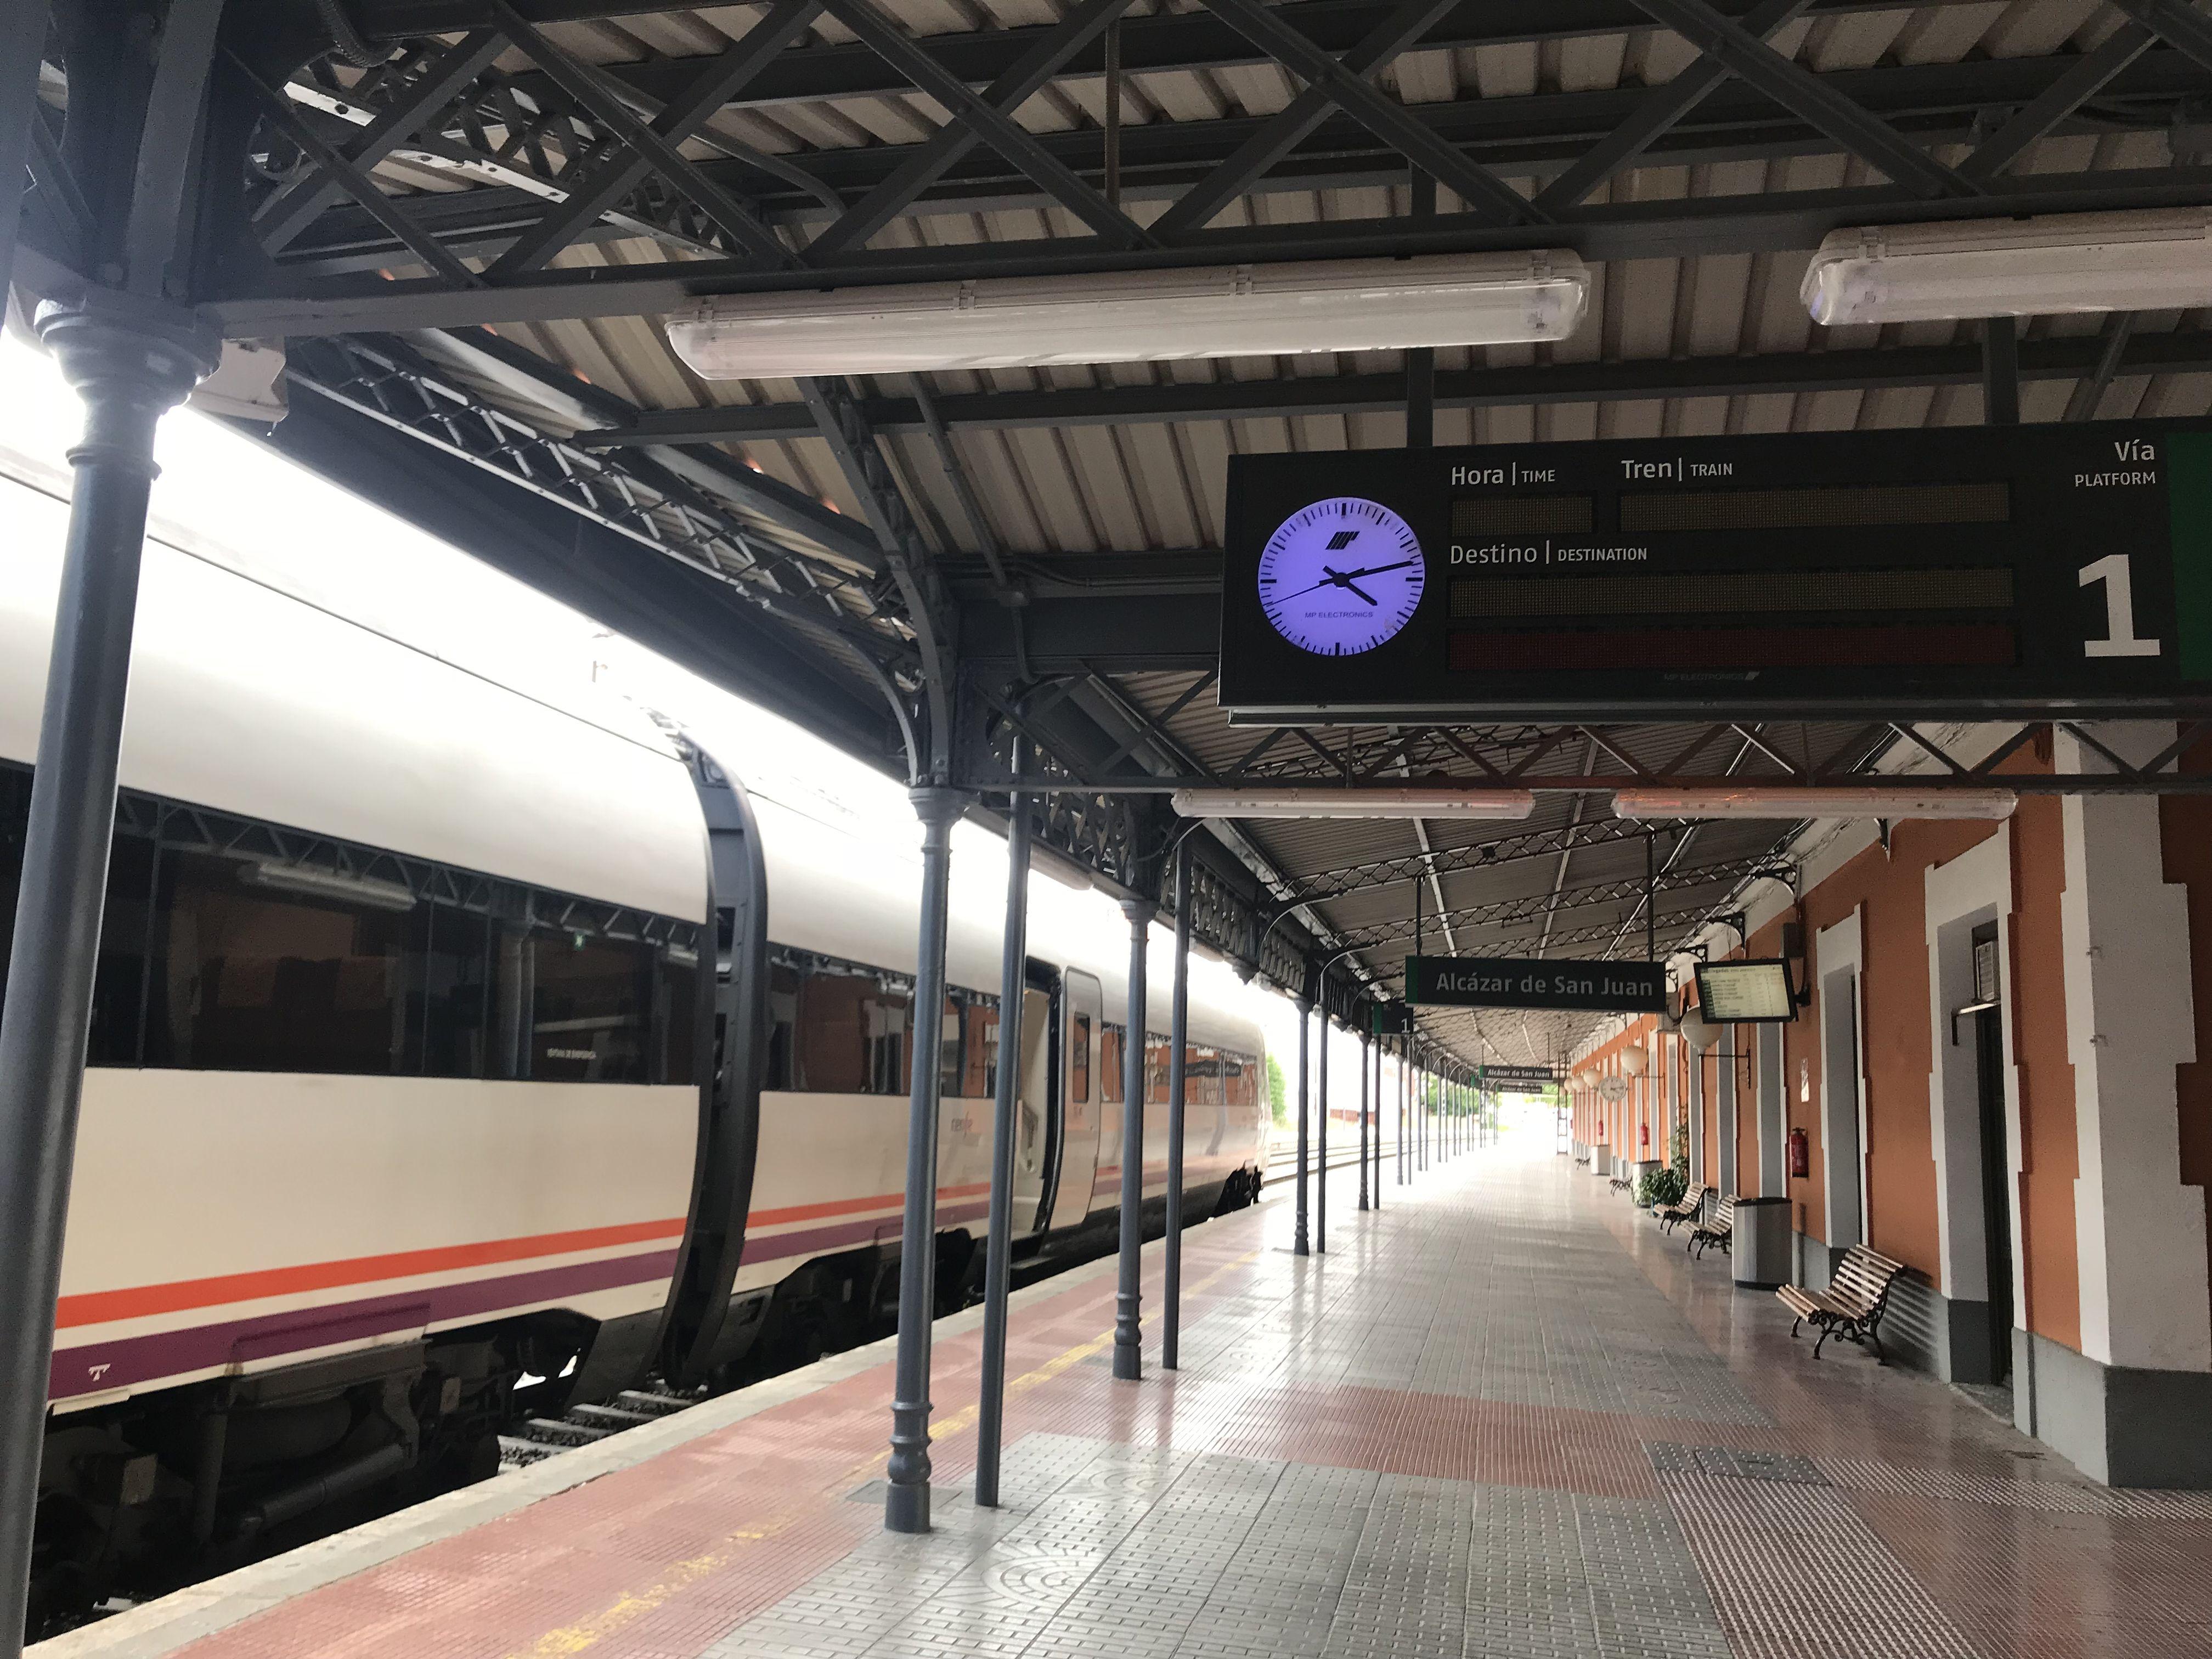 Estacion De Ferrocarril De Alcazar De San Juan Renfe Con Imagenes